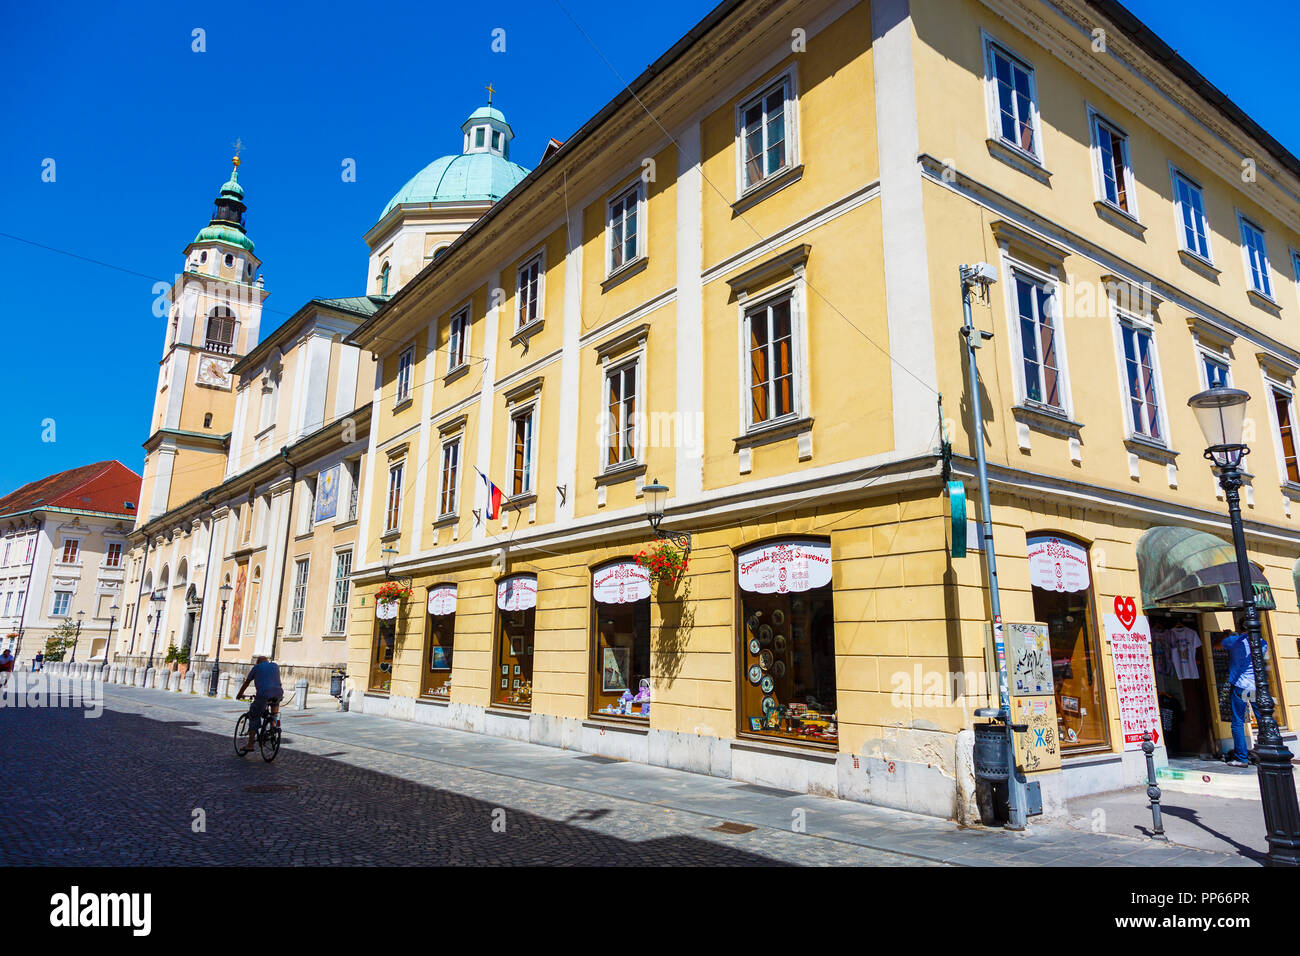 Edifice and Ljubljana Cathedral or St. Nicholas's Church. - Stock Image